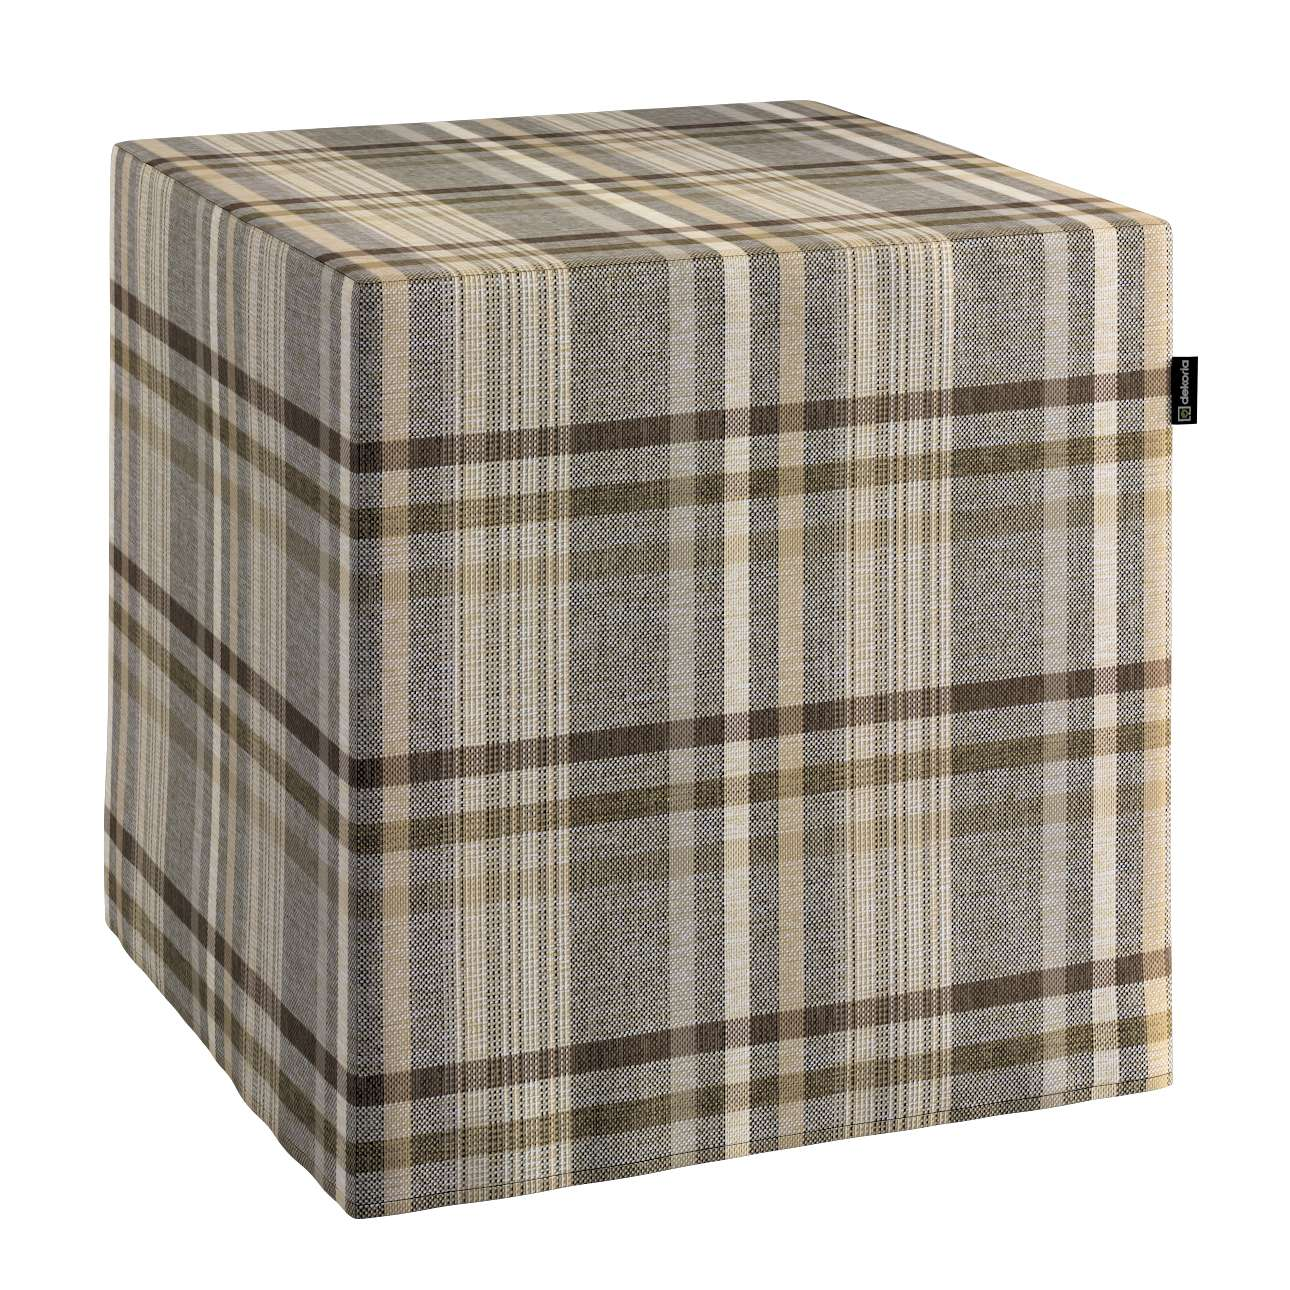 Pufa kostka w kolekcji Edinburgh, tkanina: 703-17